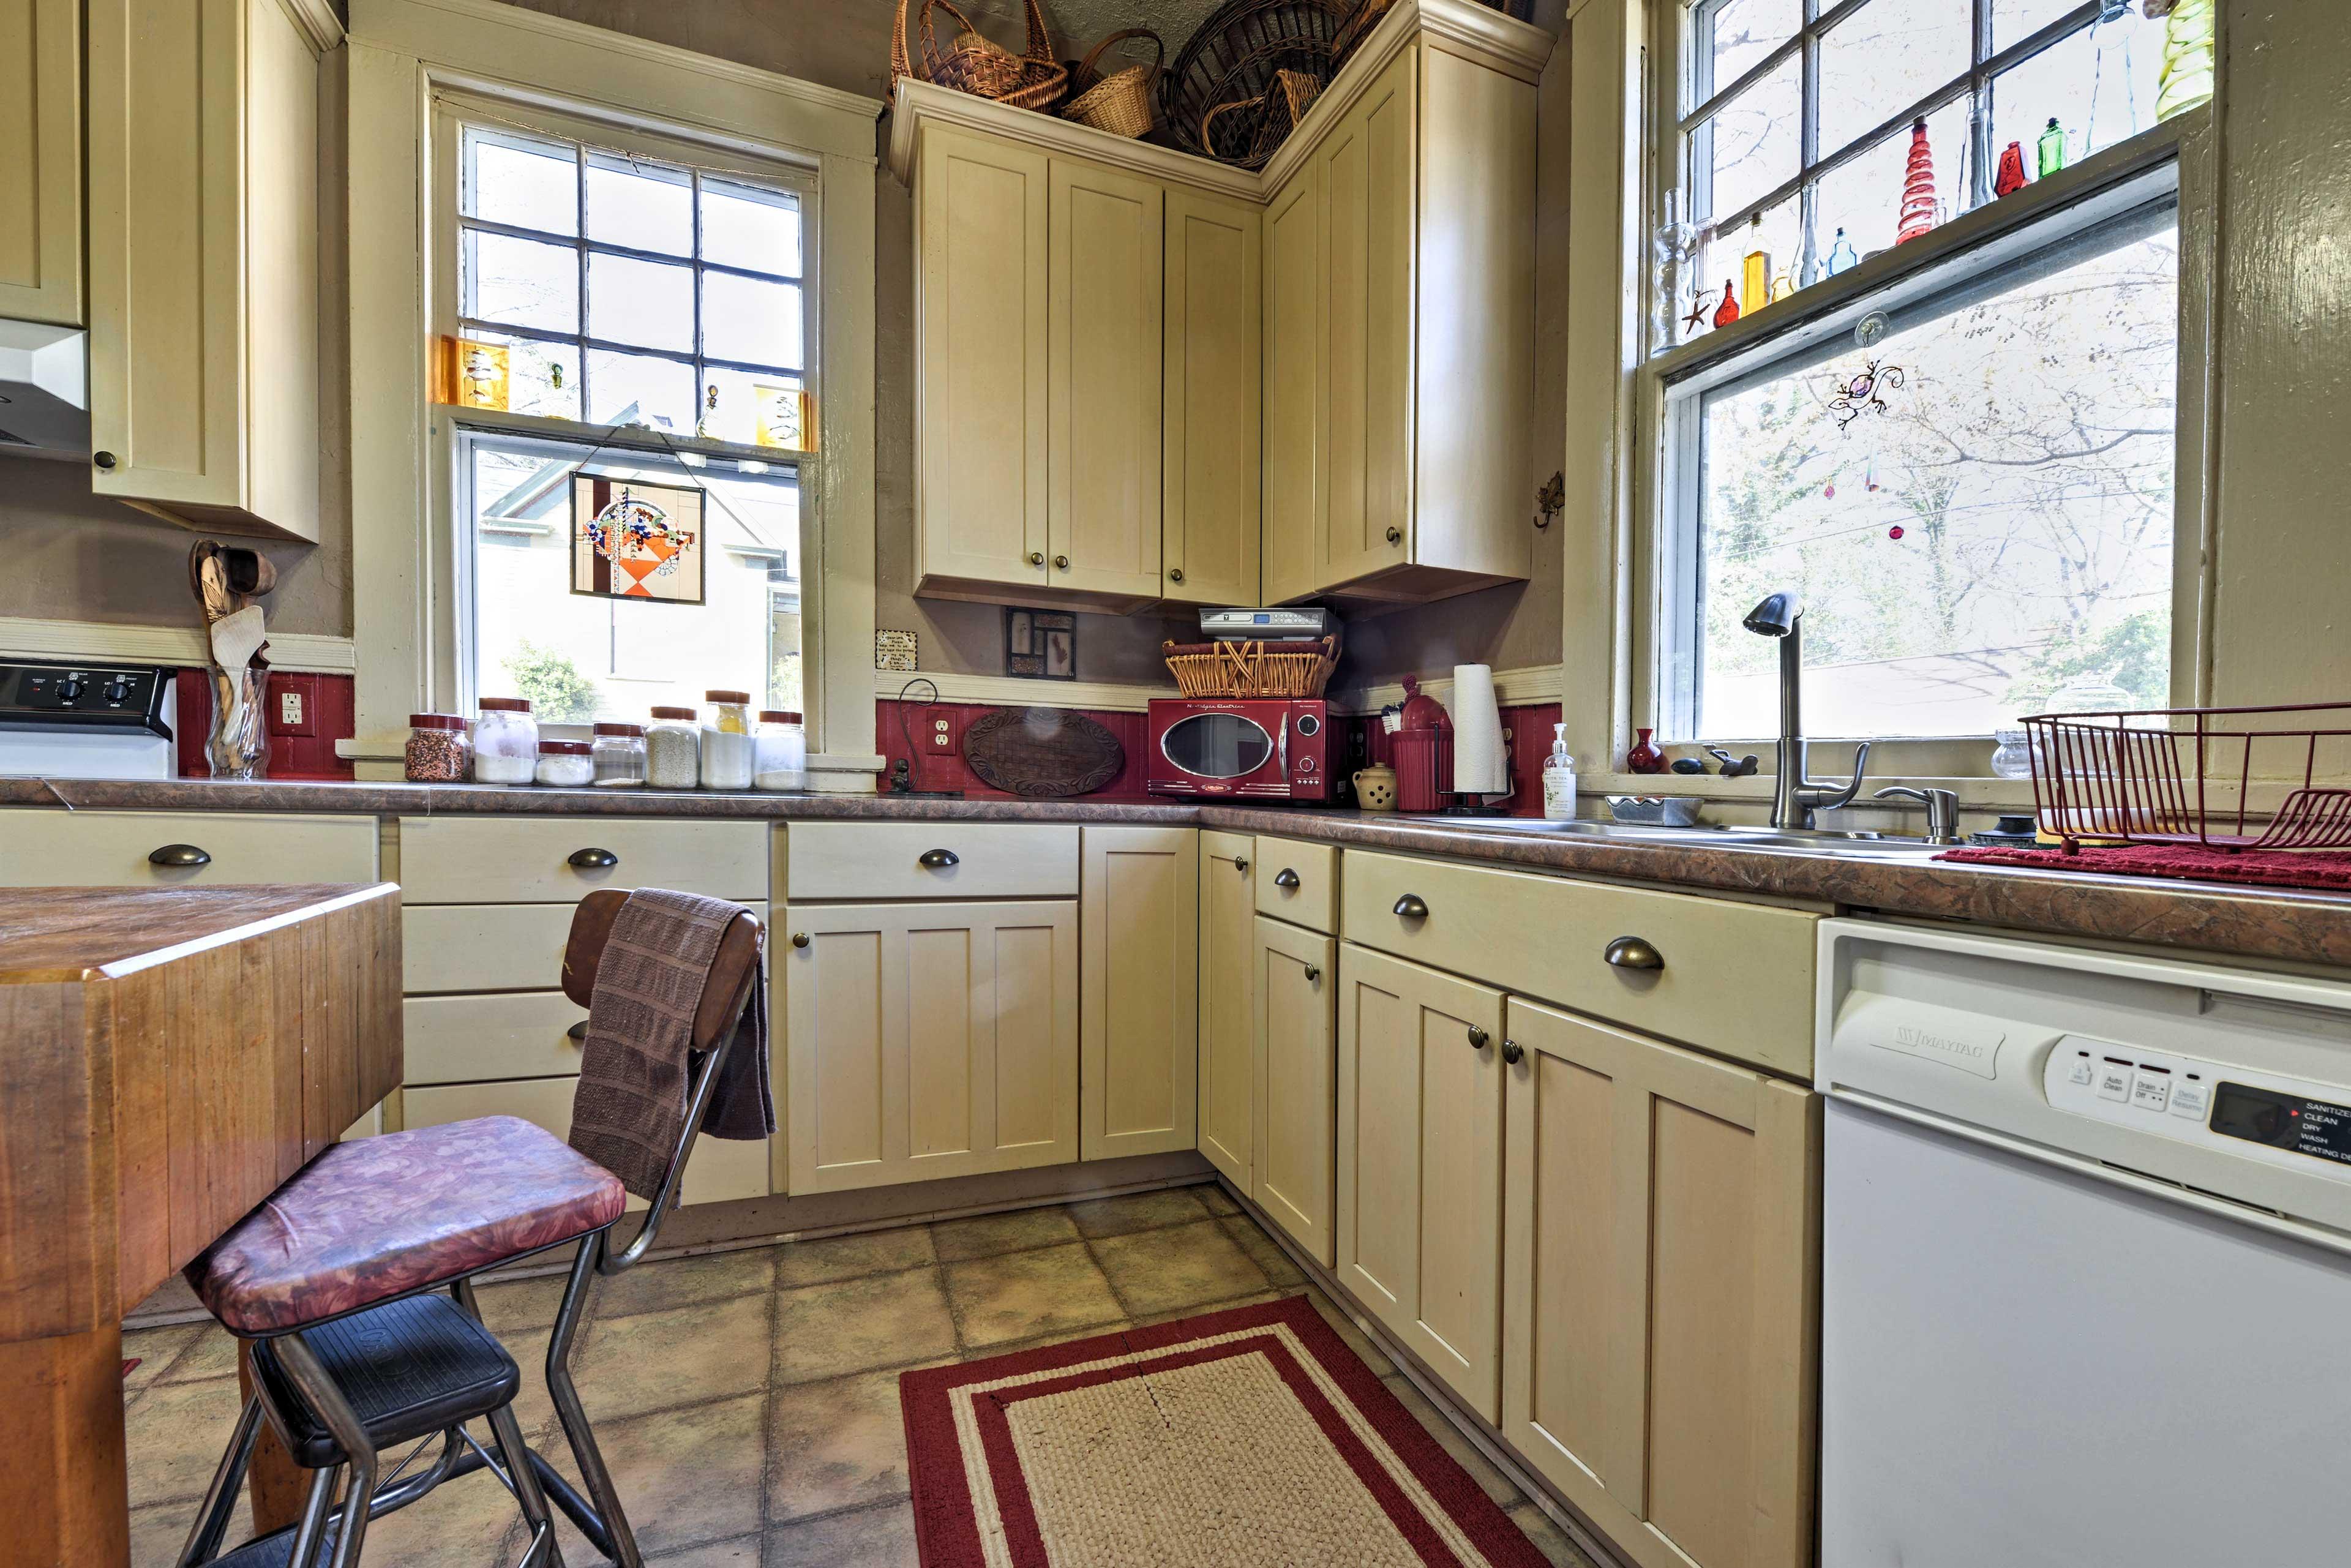 Prepare meals using modern appliances!